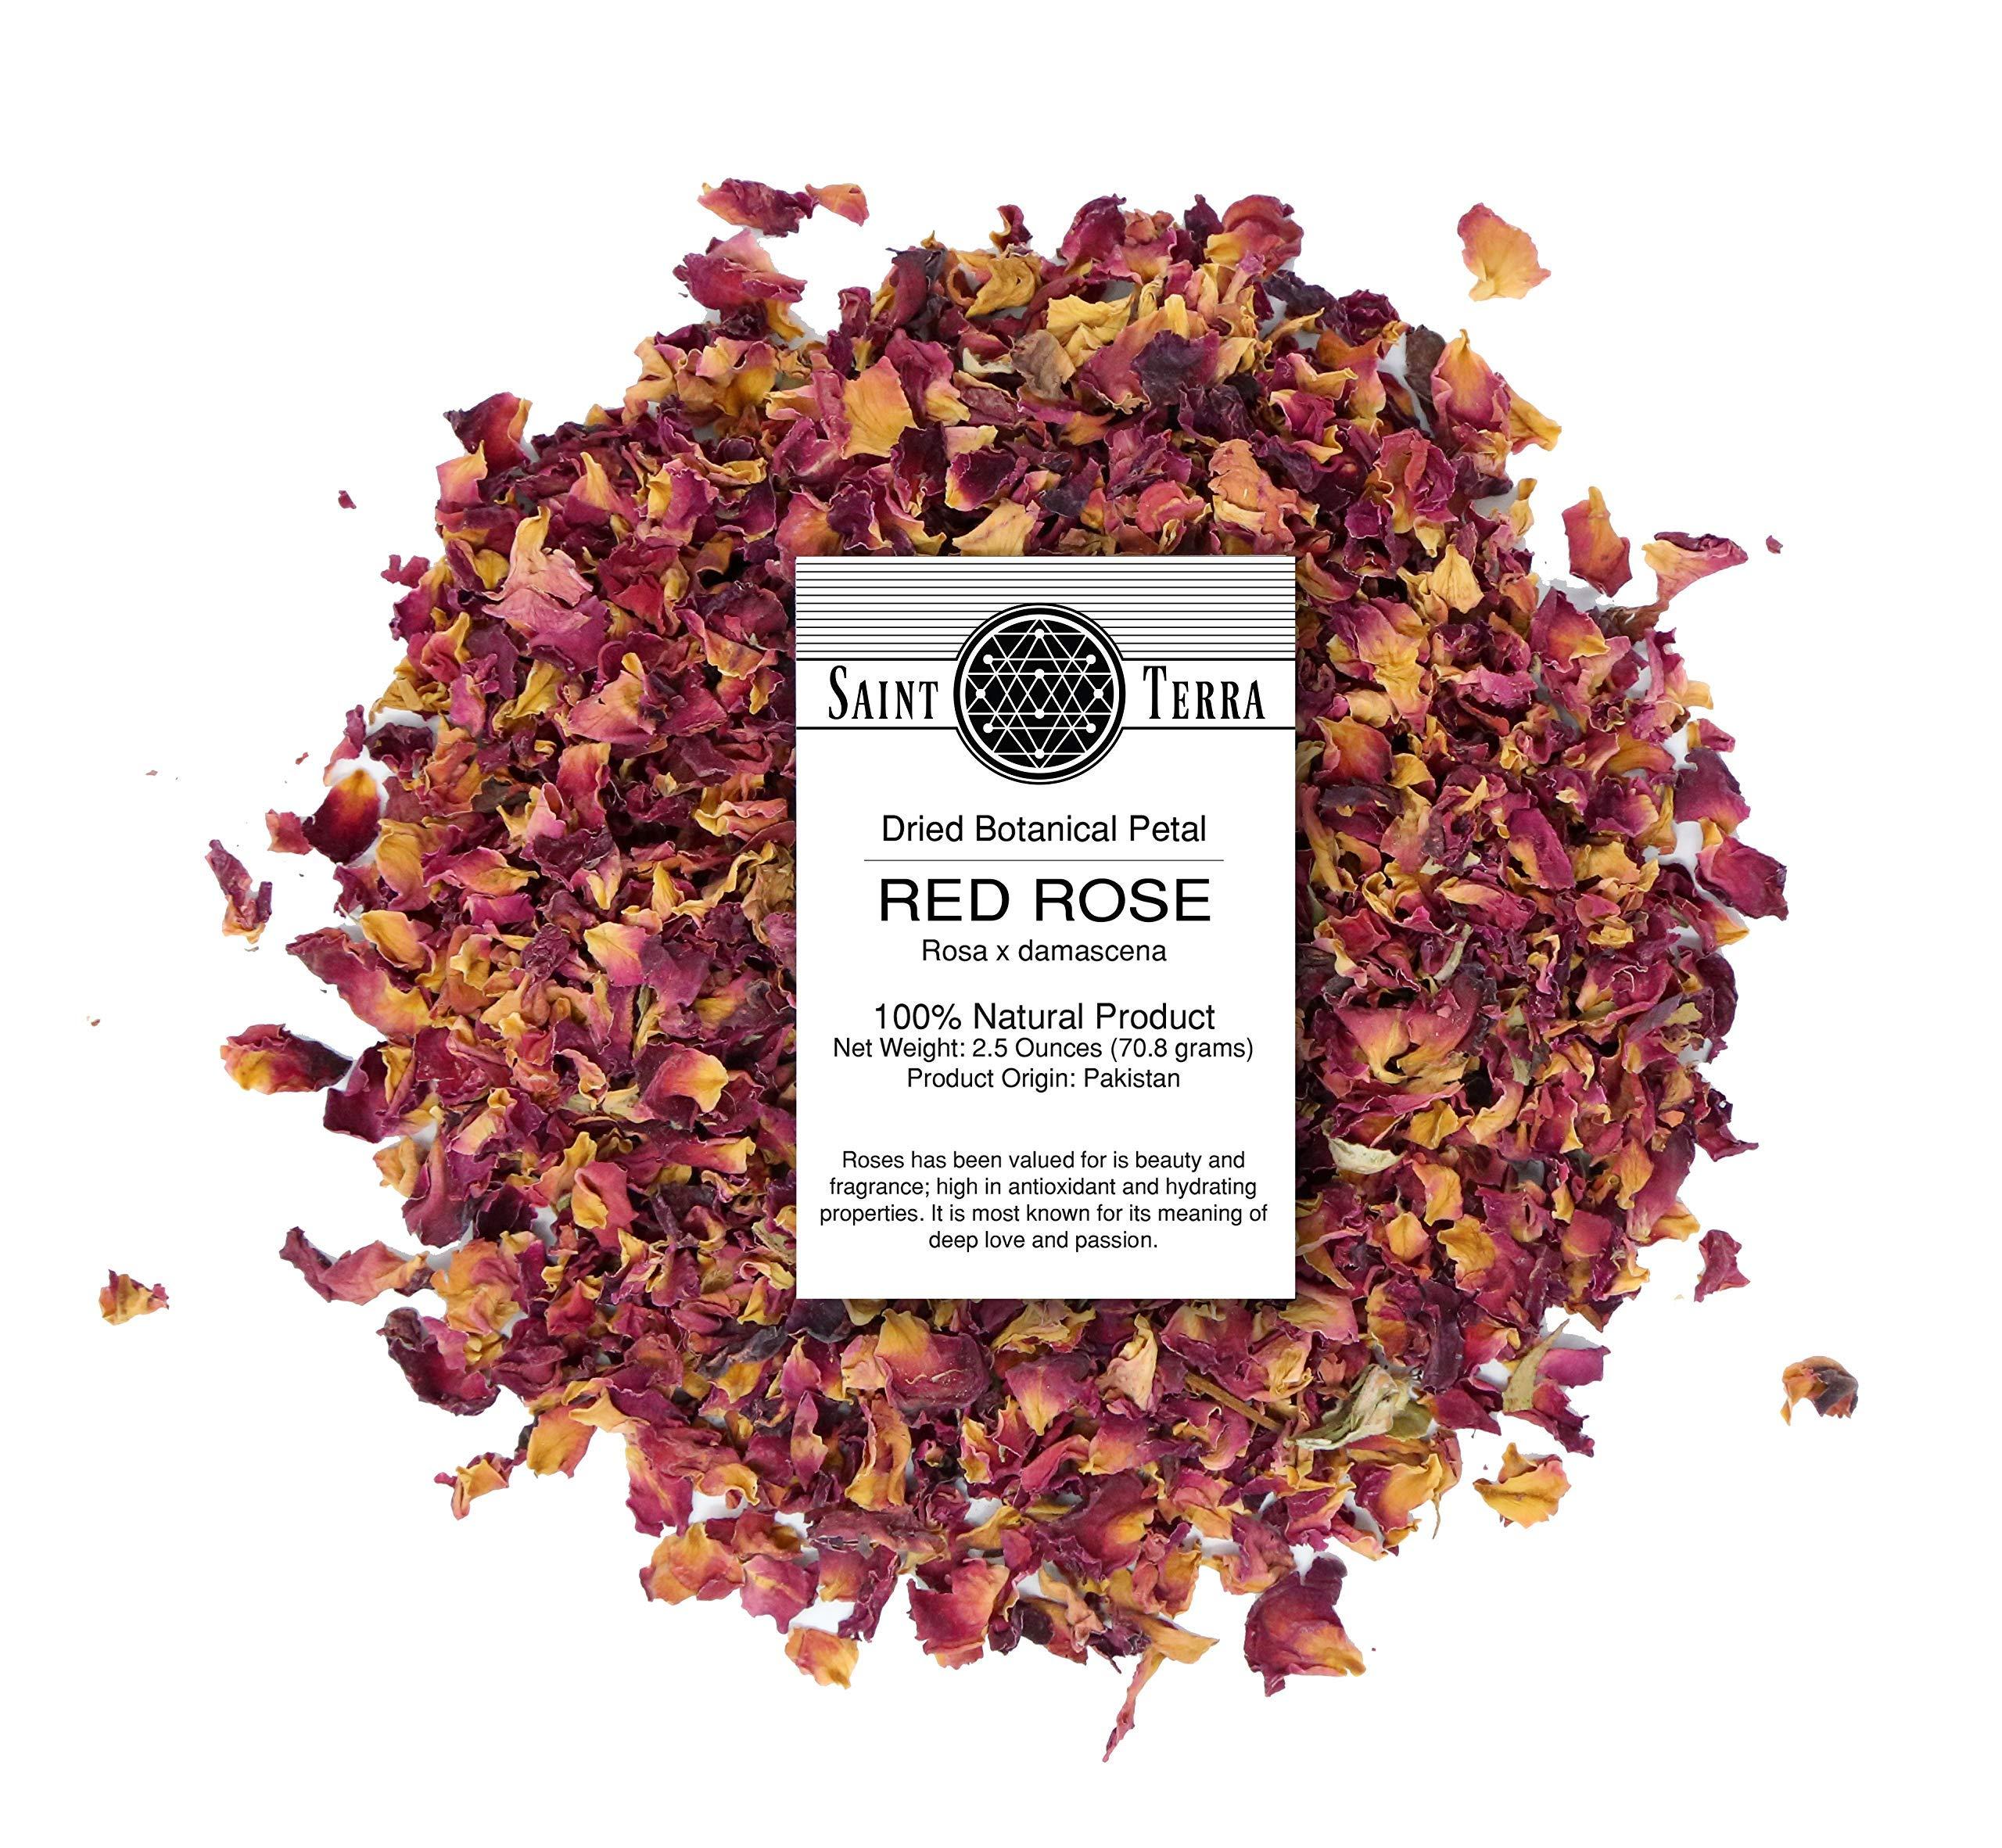 Saint Terra Dried Red Rose Petals, 2.5 Ounces